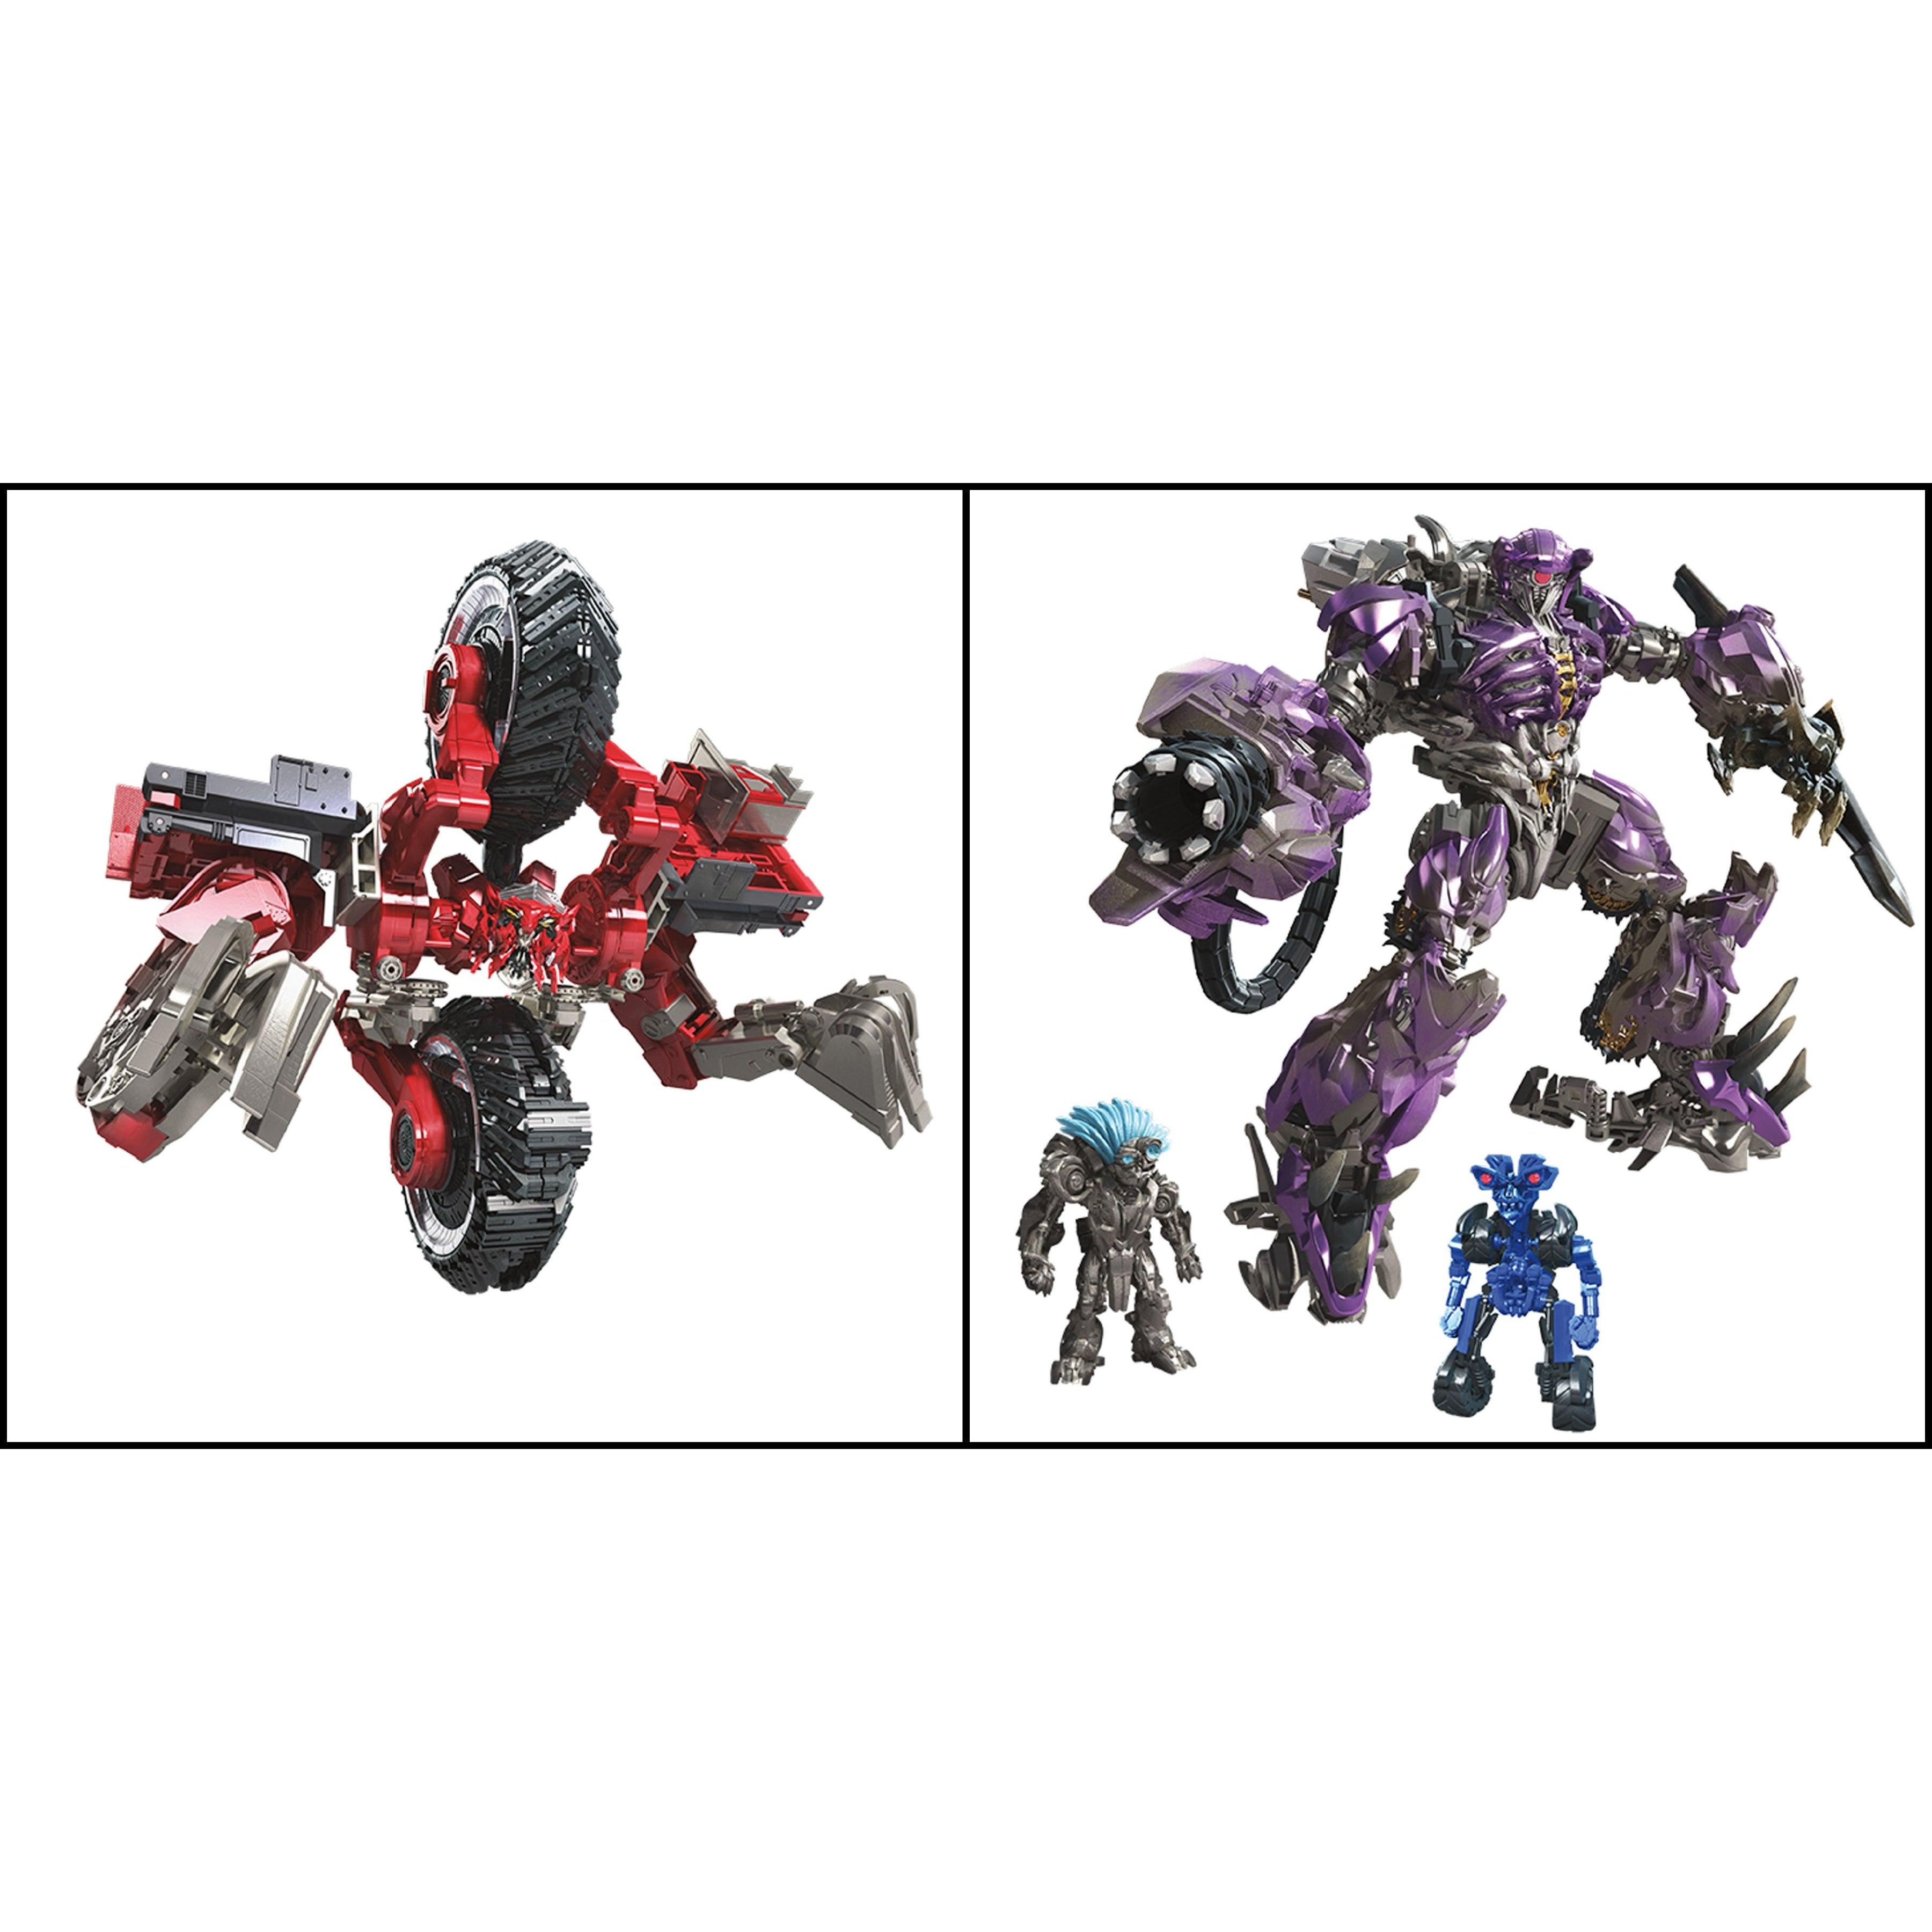 Image of Transformers Studio Series Premier Leader Wave 4 - Set of 2 - JANUARY 2020